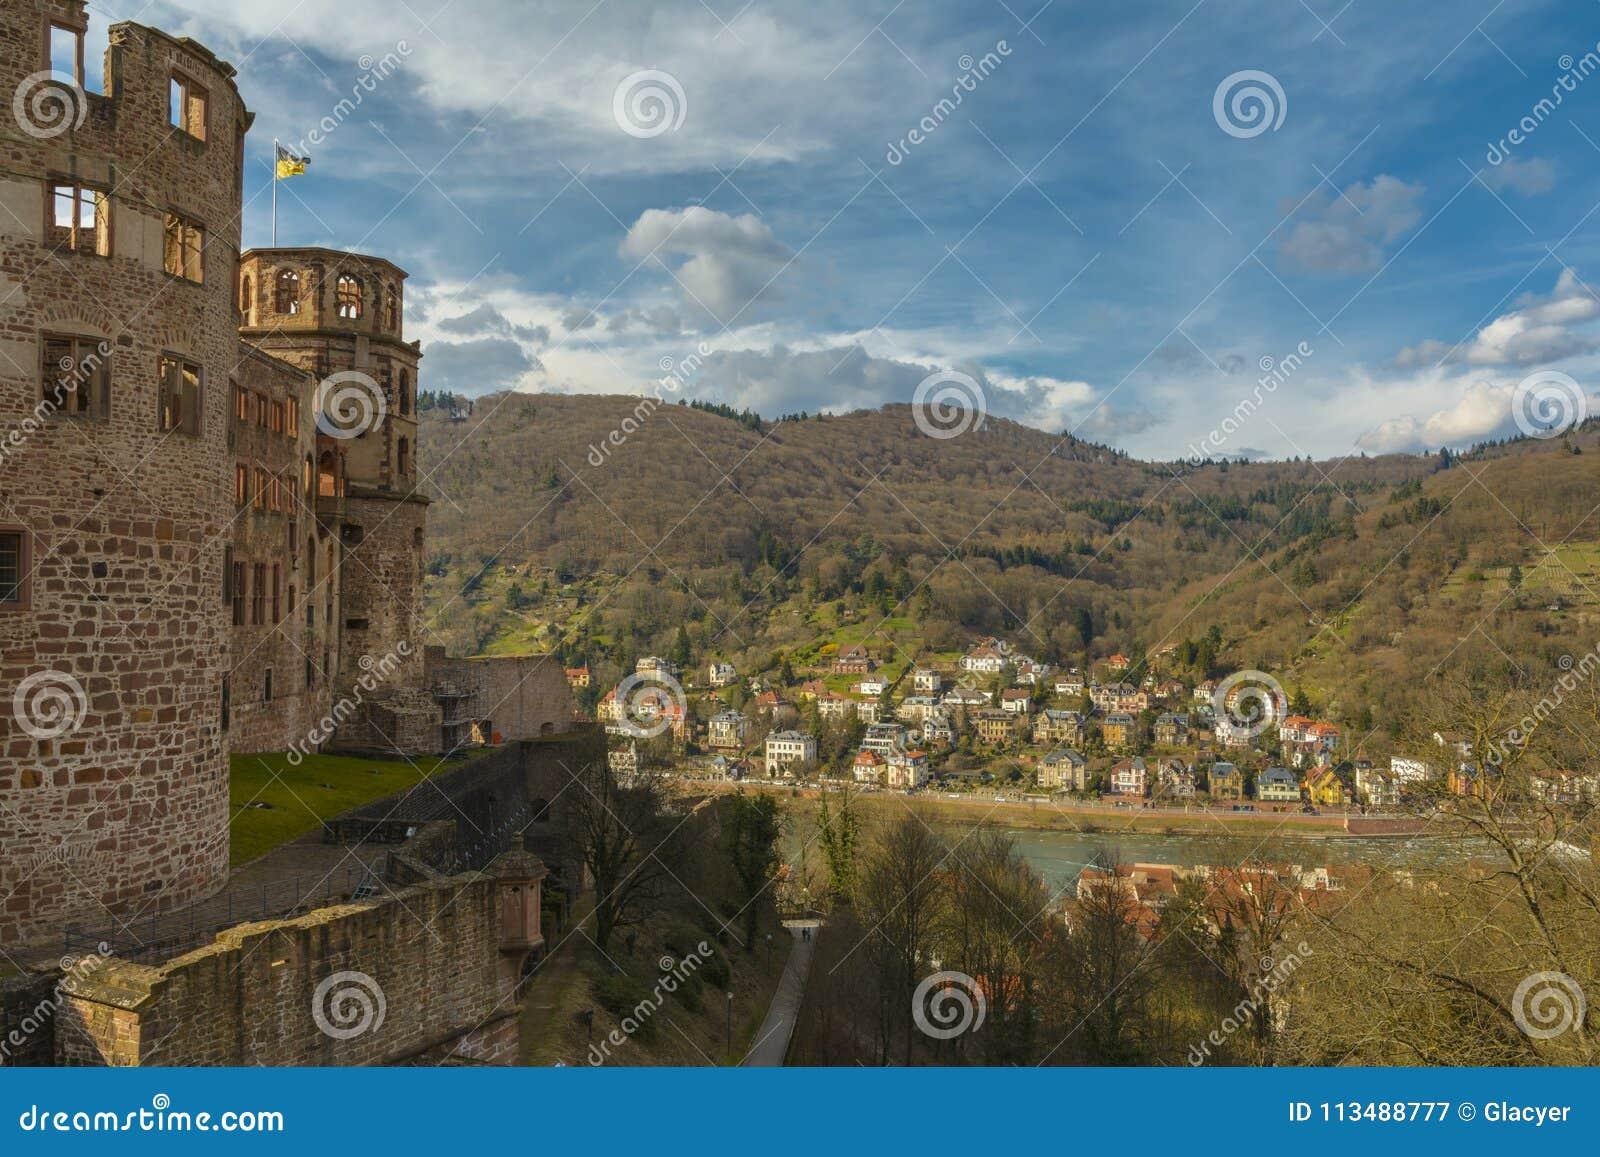 Heidelberg Castle, Baden-Wurttemberg, Germany